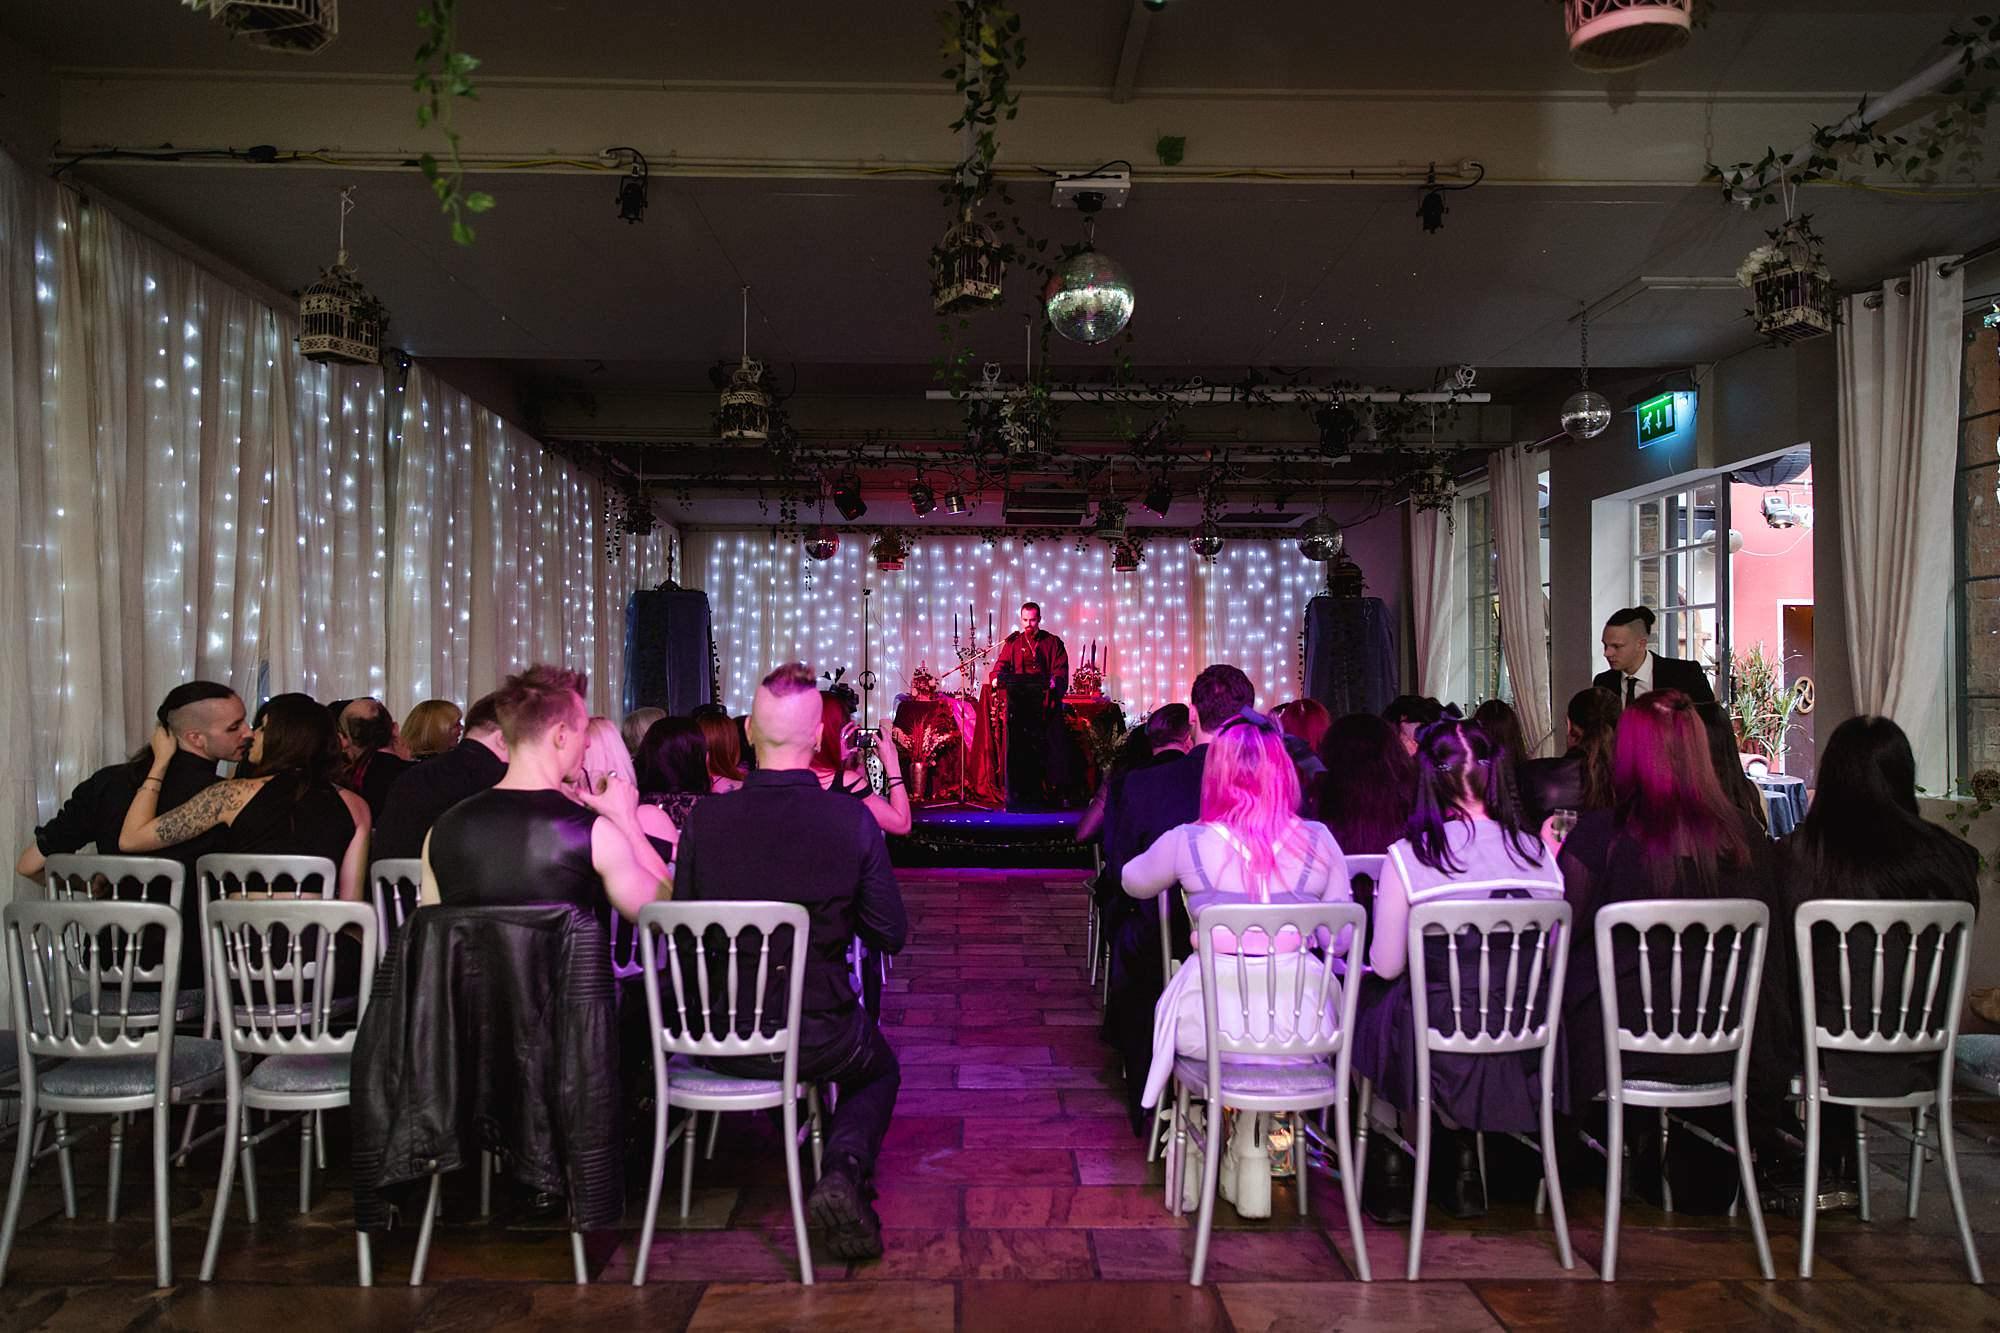 Gothic wedding London setup for ceremony at islington metalworks